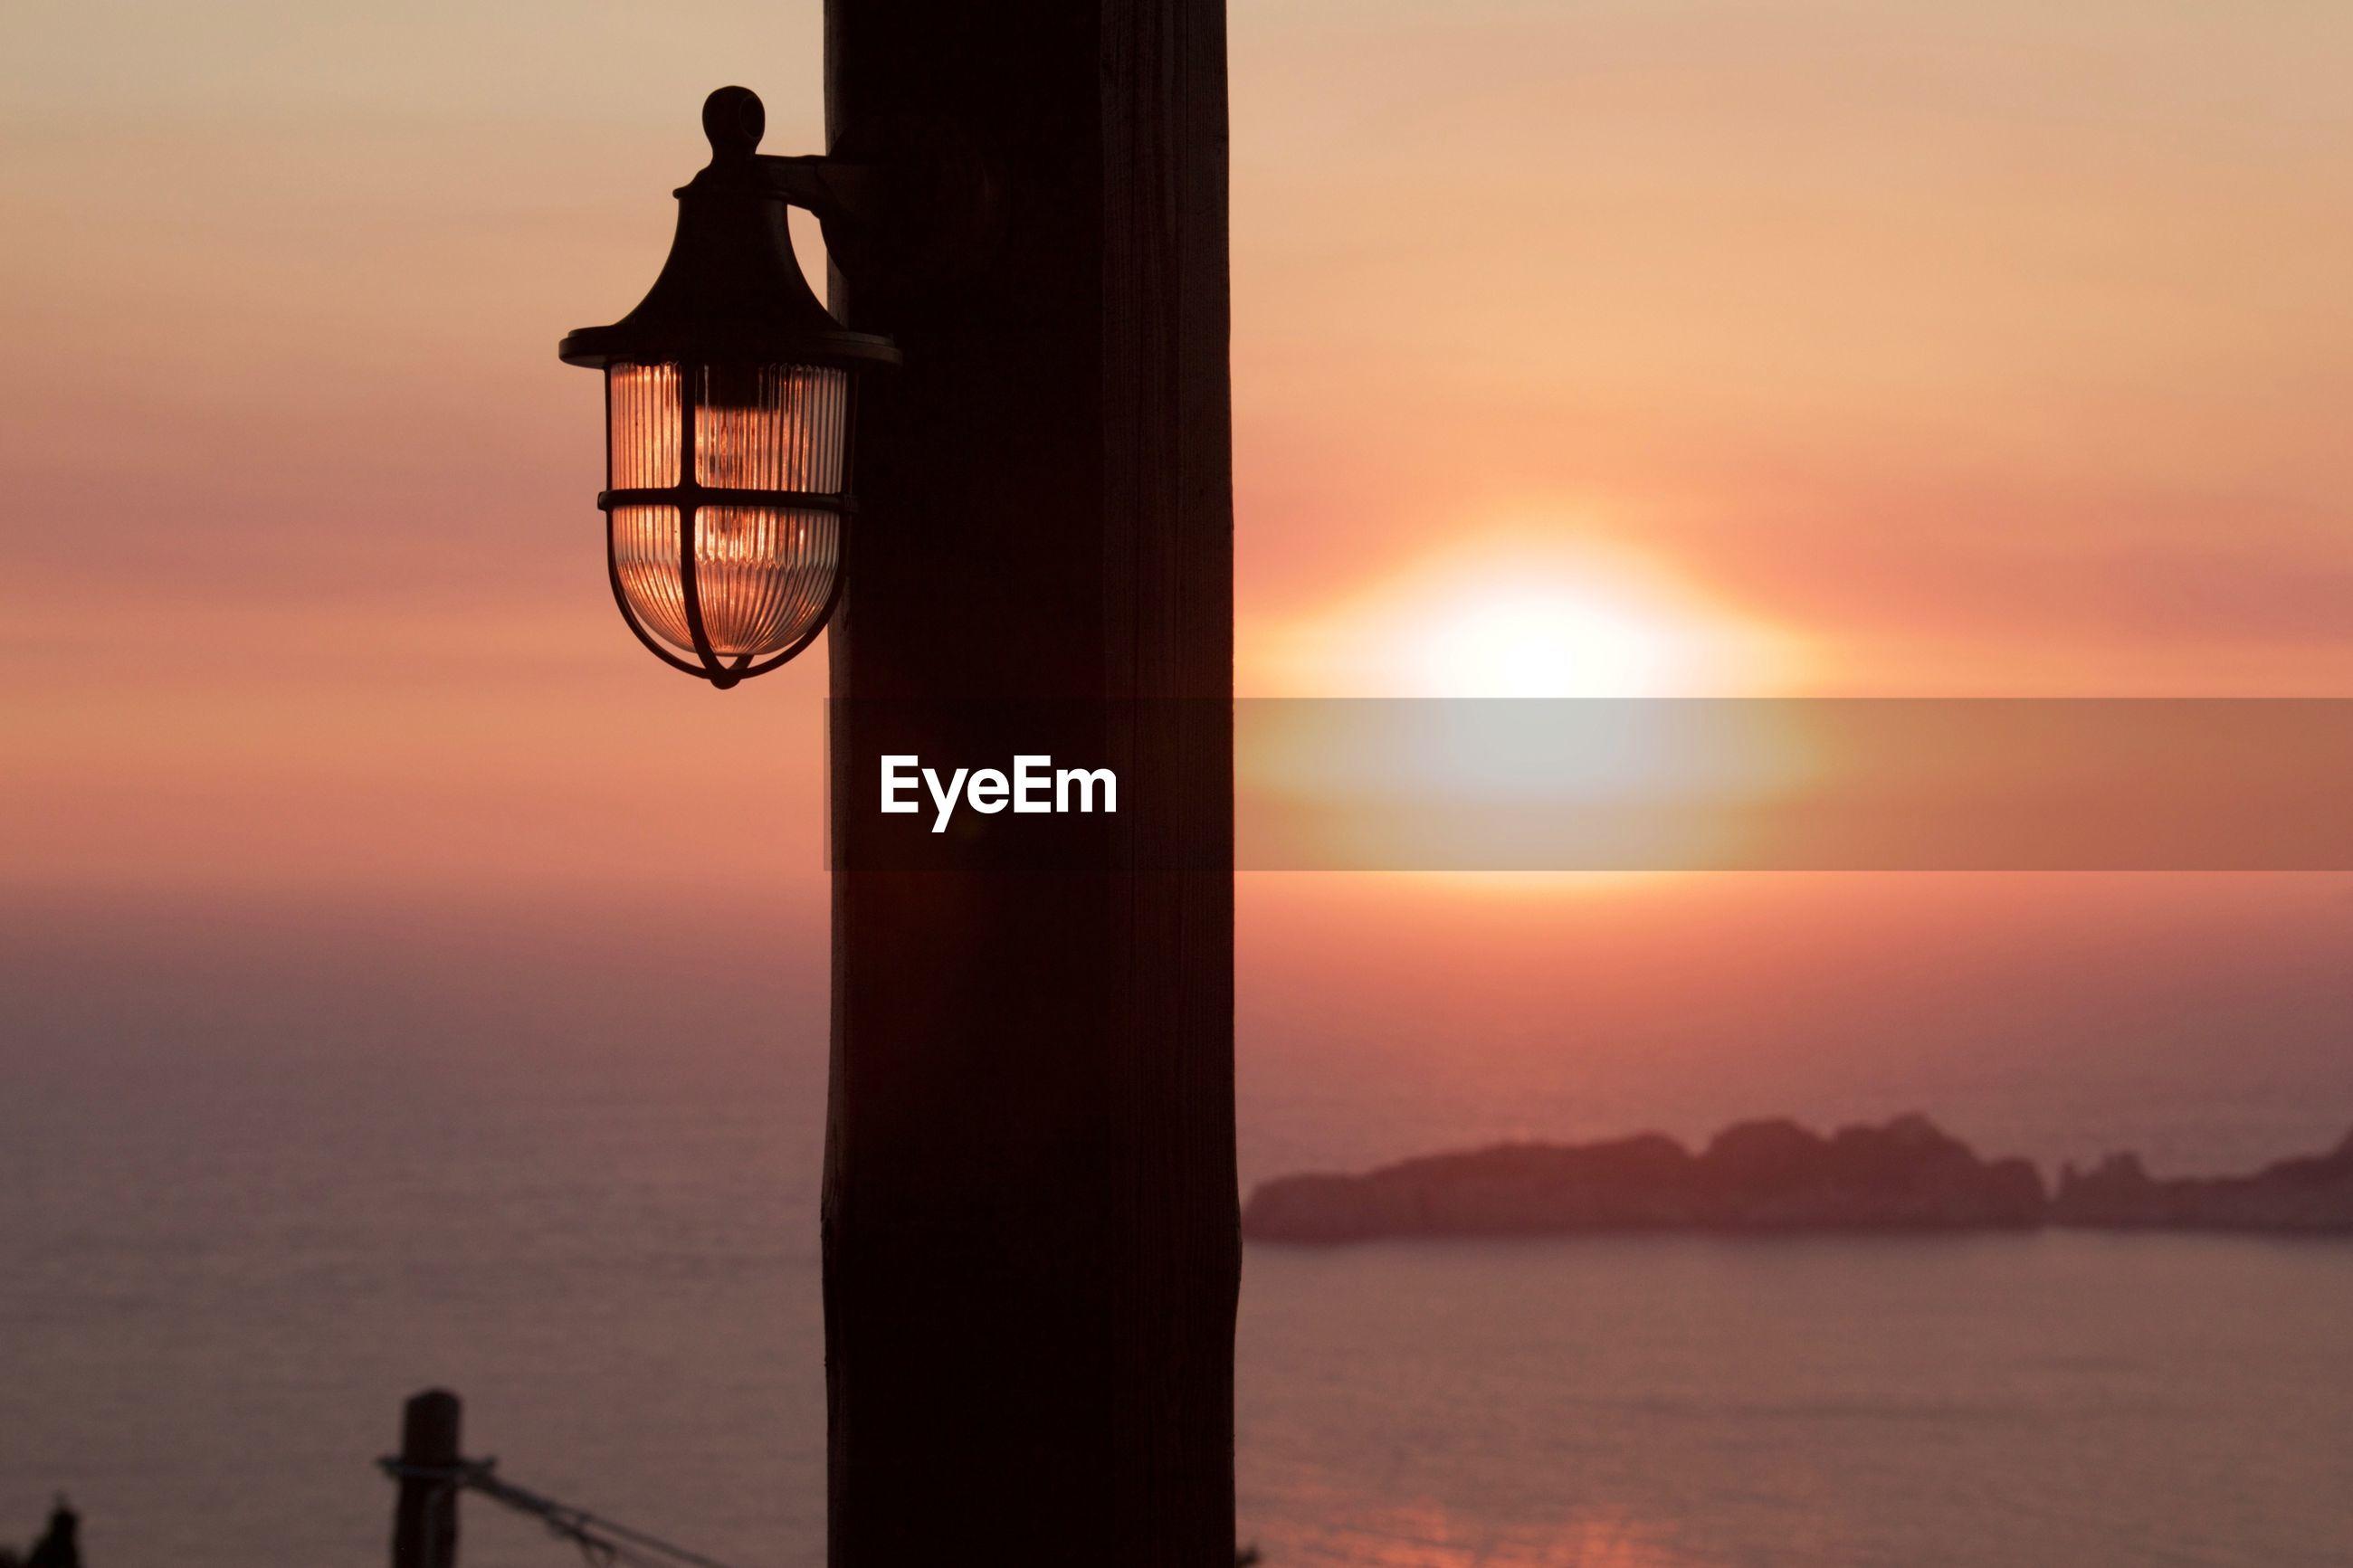 SILHOUETTE LAMP BY SEA AGAINST ORANGE SKY